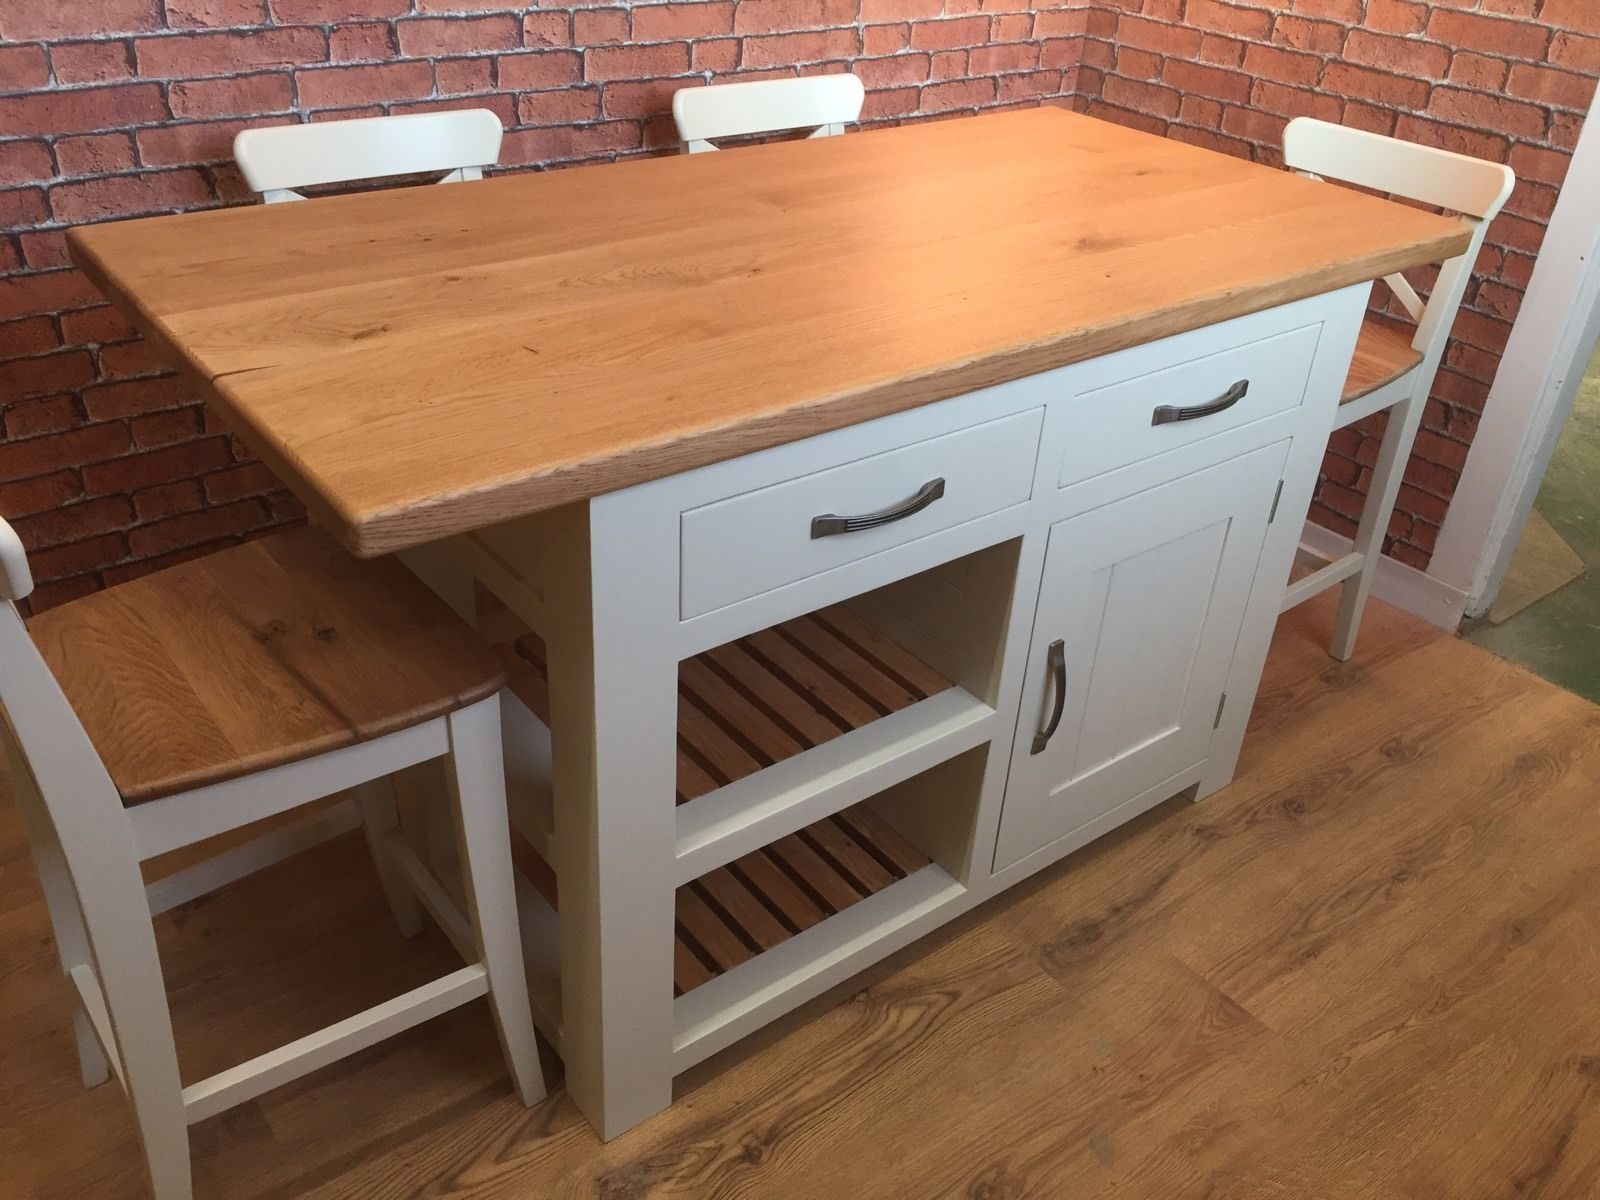 Handmade Kitchen Island - Solid Oak Top - Breakfast Bar - Bar Stools ...